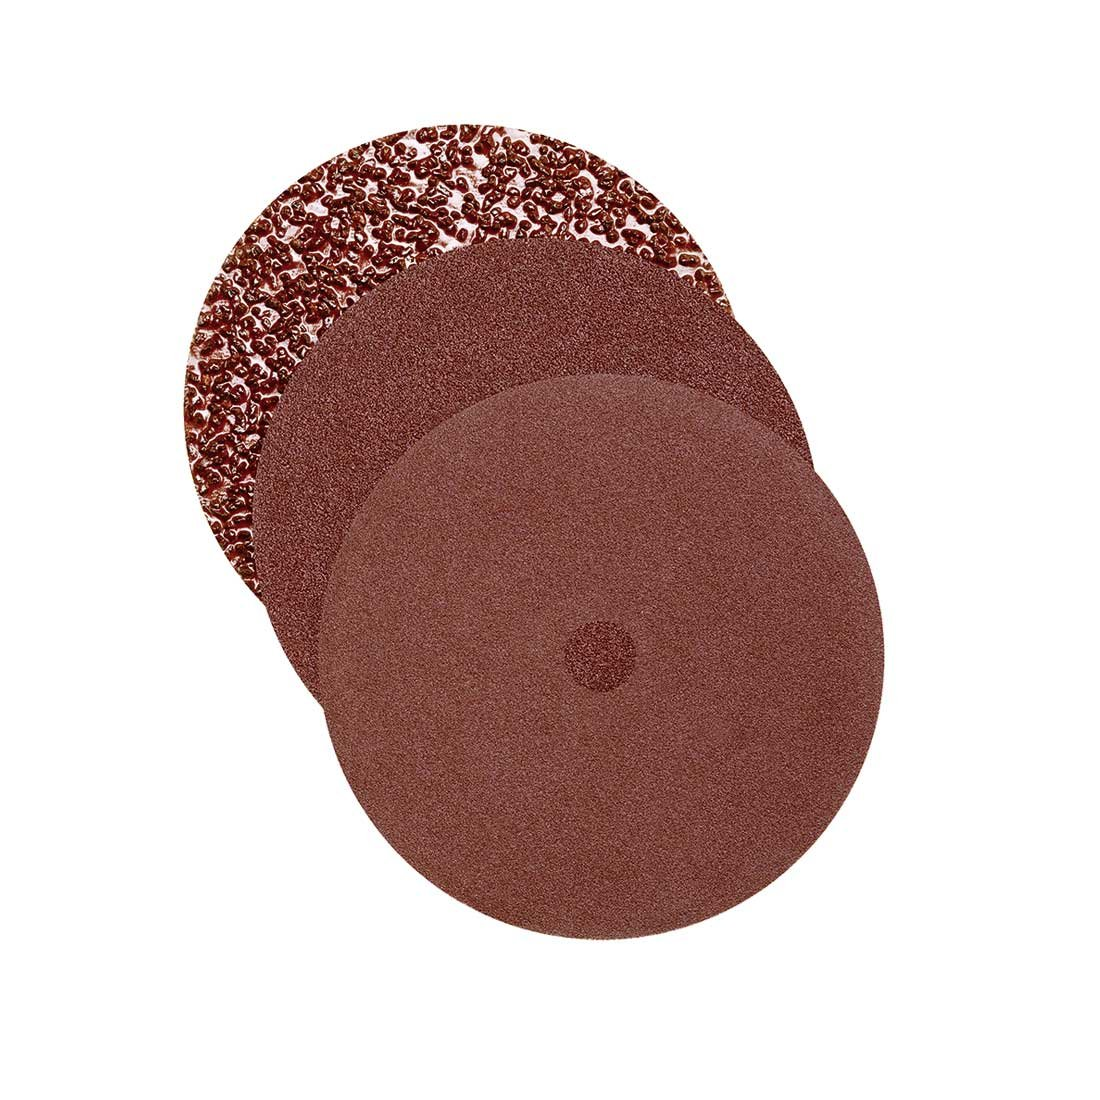 5 Pz. G36 RETOL Dischi abrasivi doppi monospazzole 406 mm p corindone normale a doppia pagina